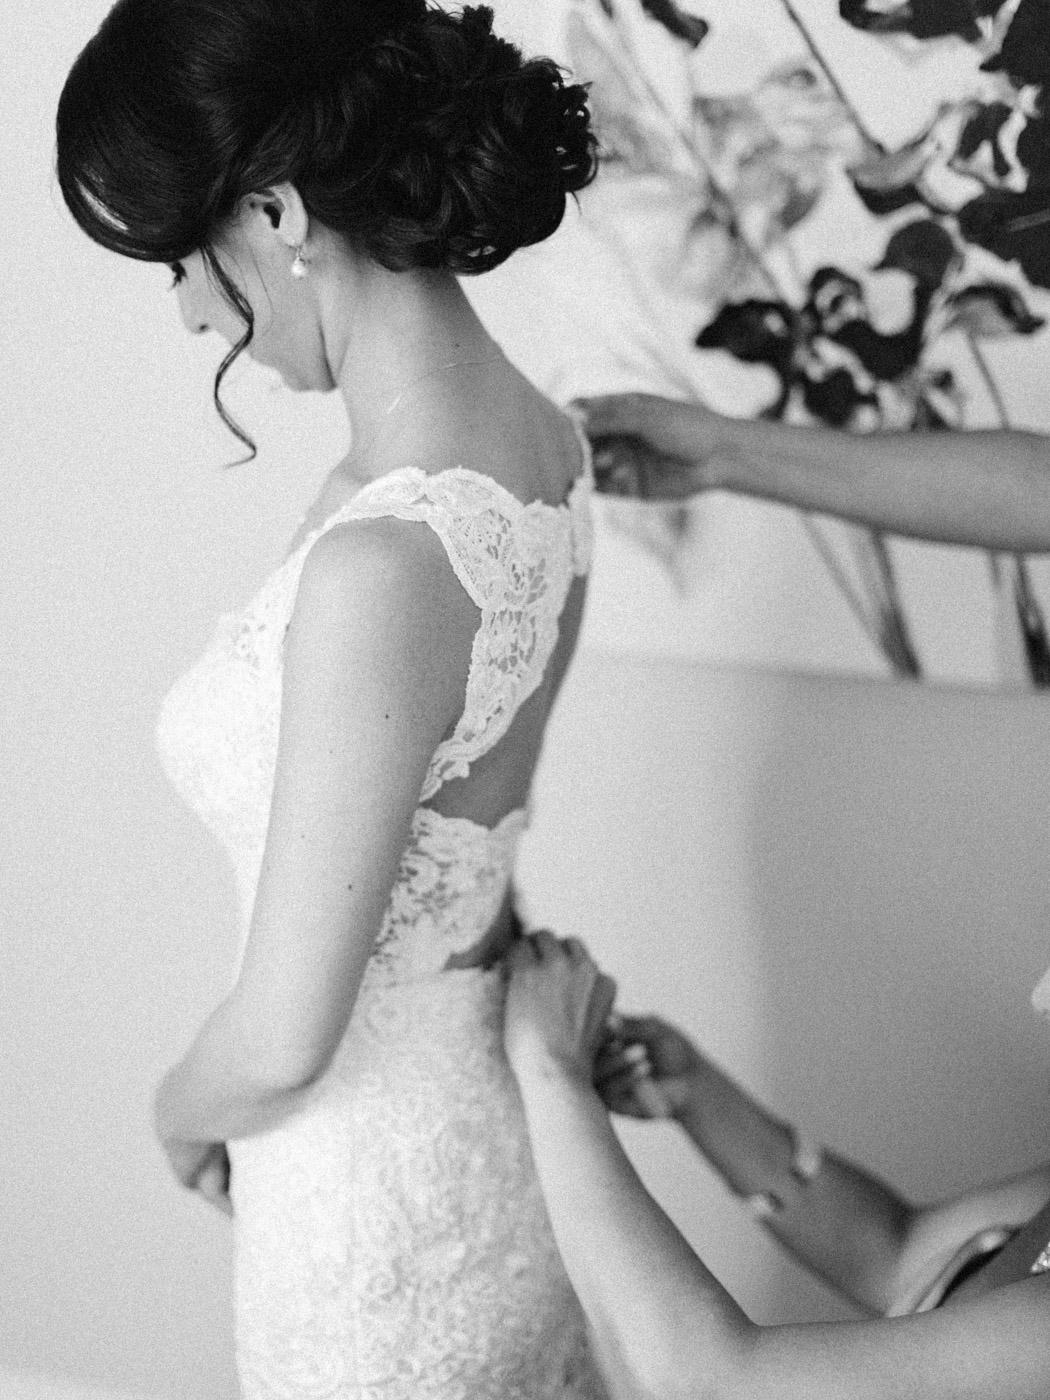 toronto_wedding_photographer_fine_art_documentary-65.jpg